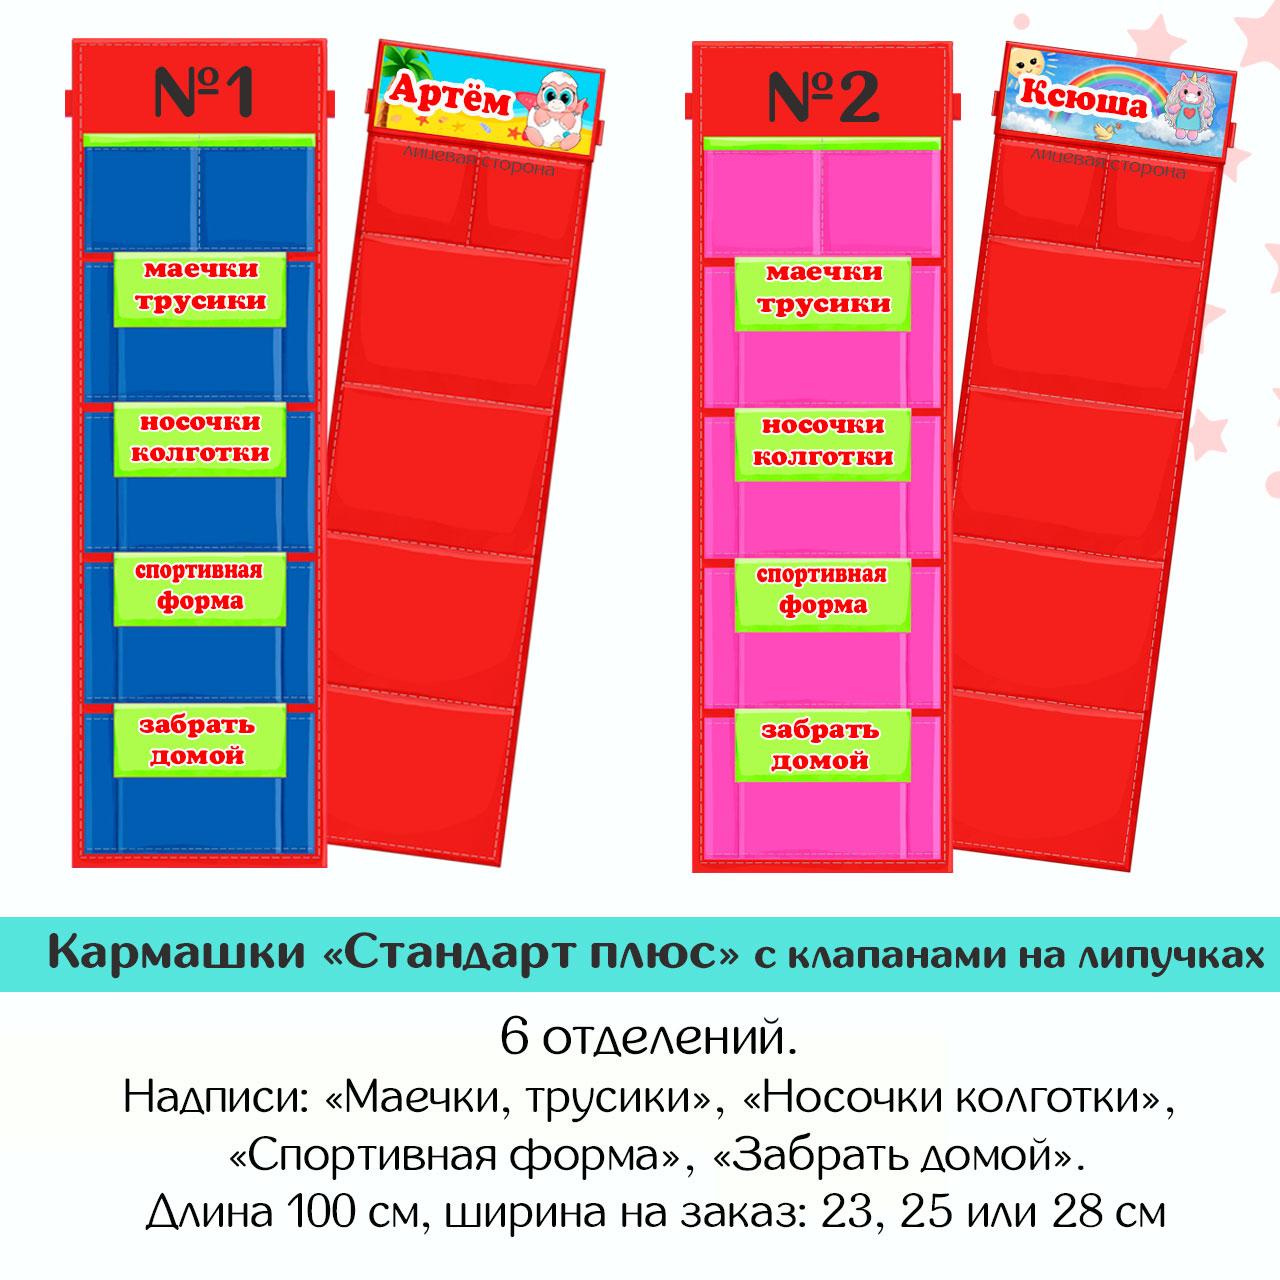 "Кармашки ""Стандарт плюс"" с клапанами на липучках за 420 руб."